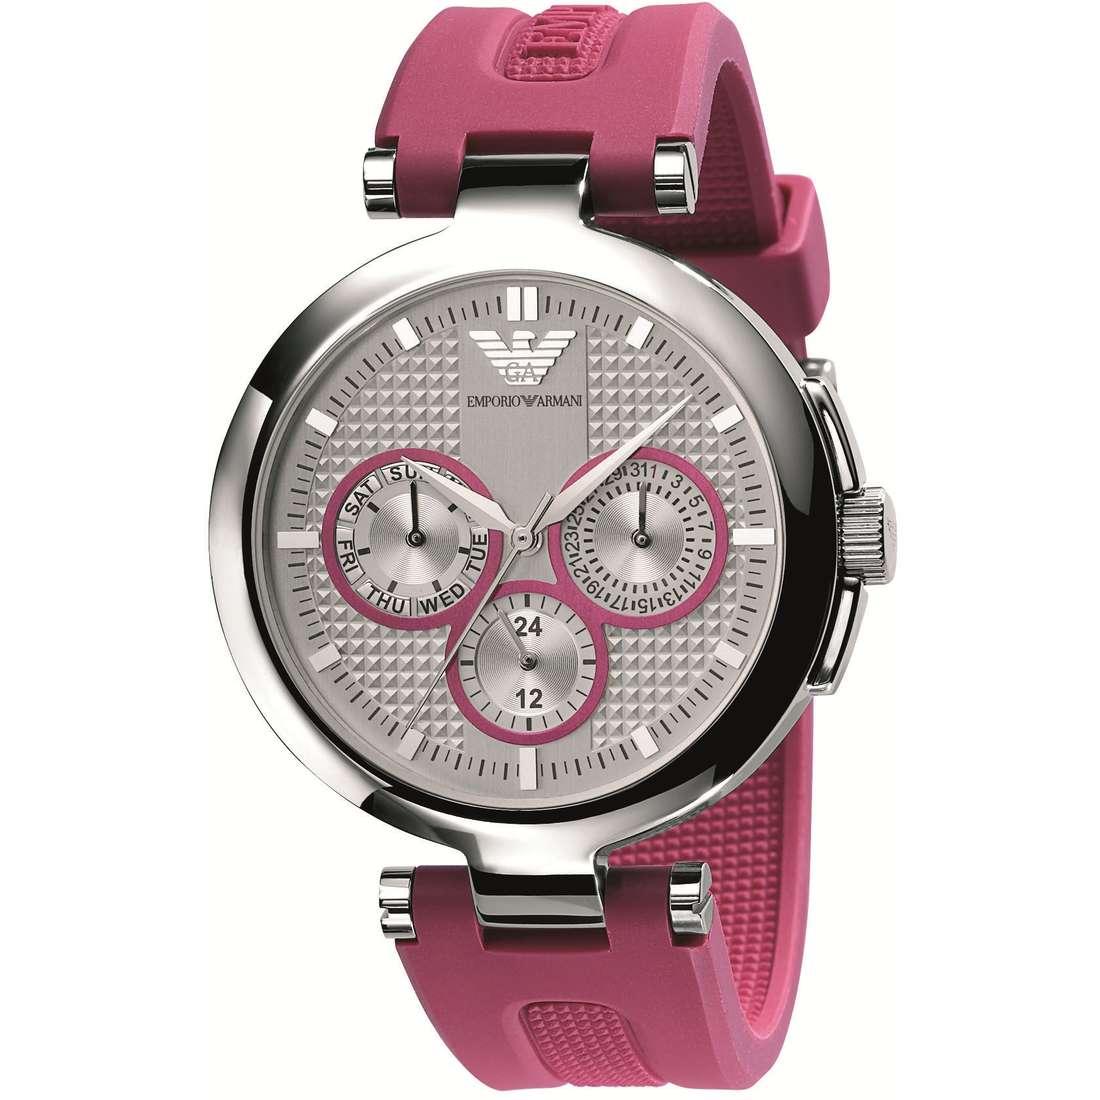 montre chronographe femme Emporio Armani AR0737